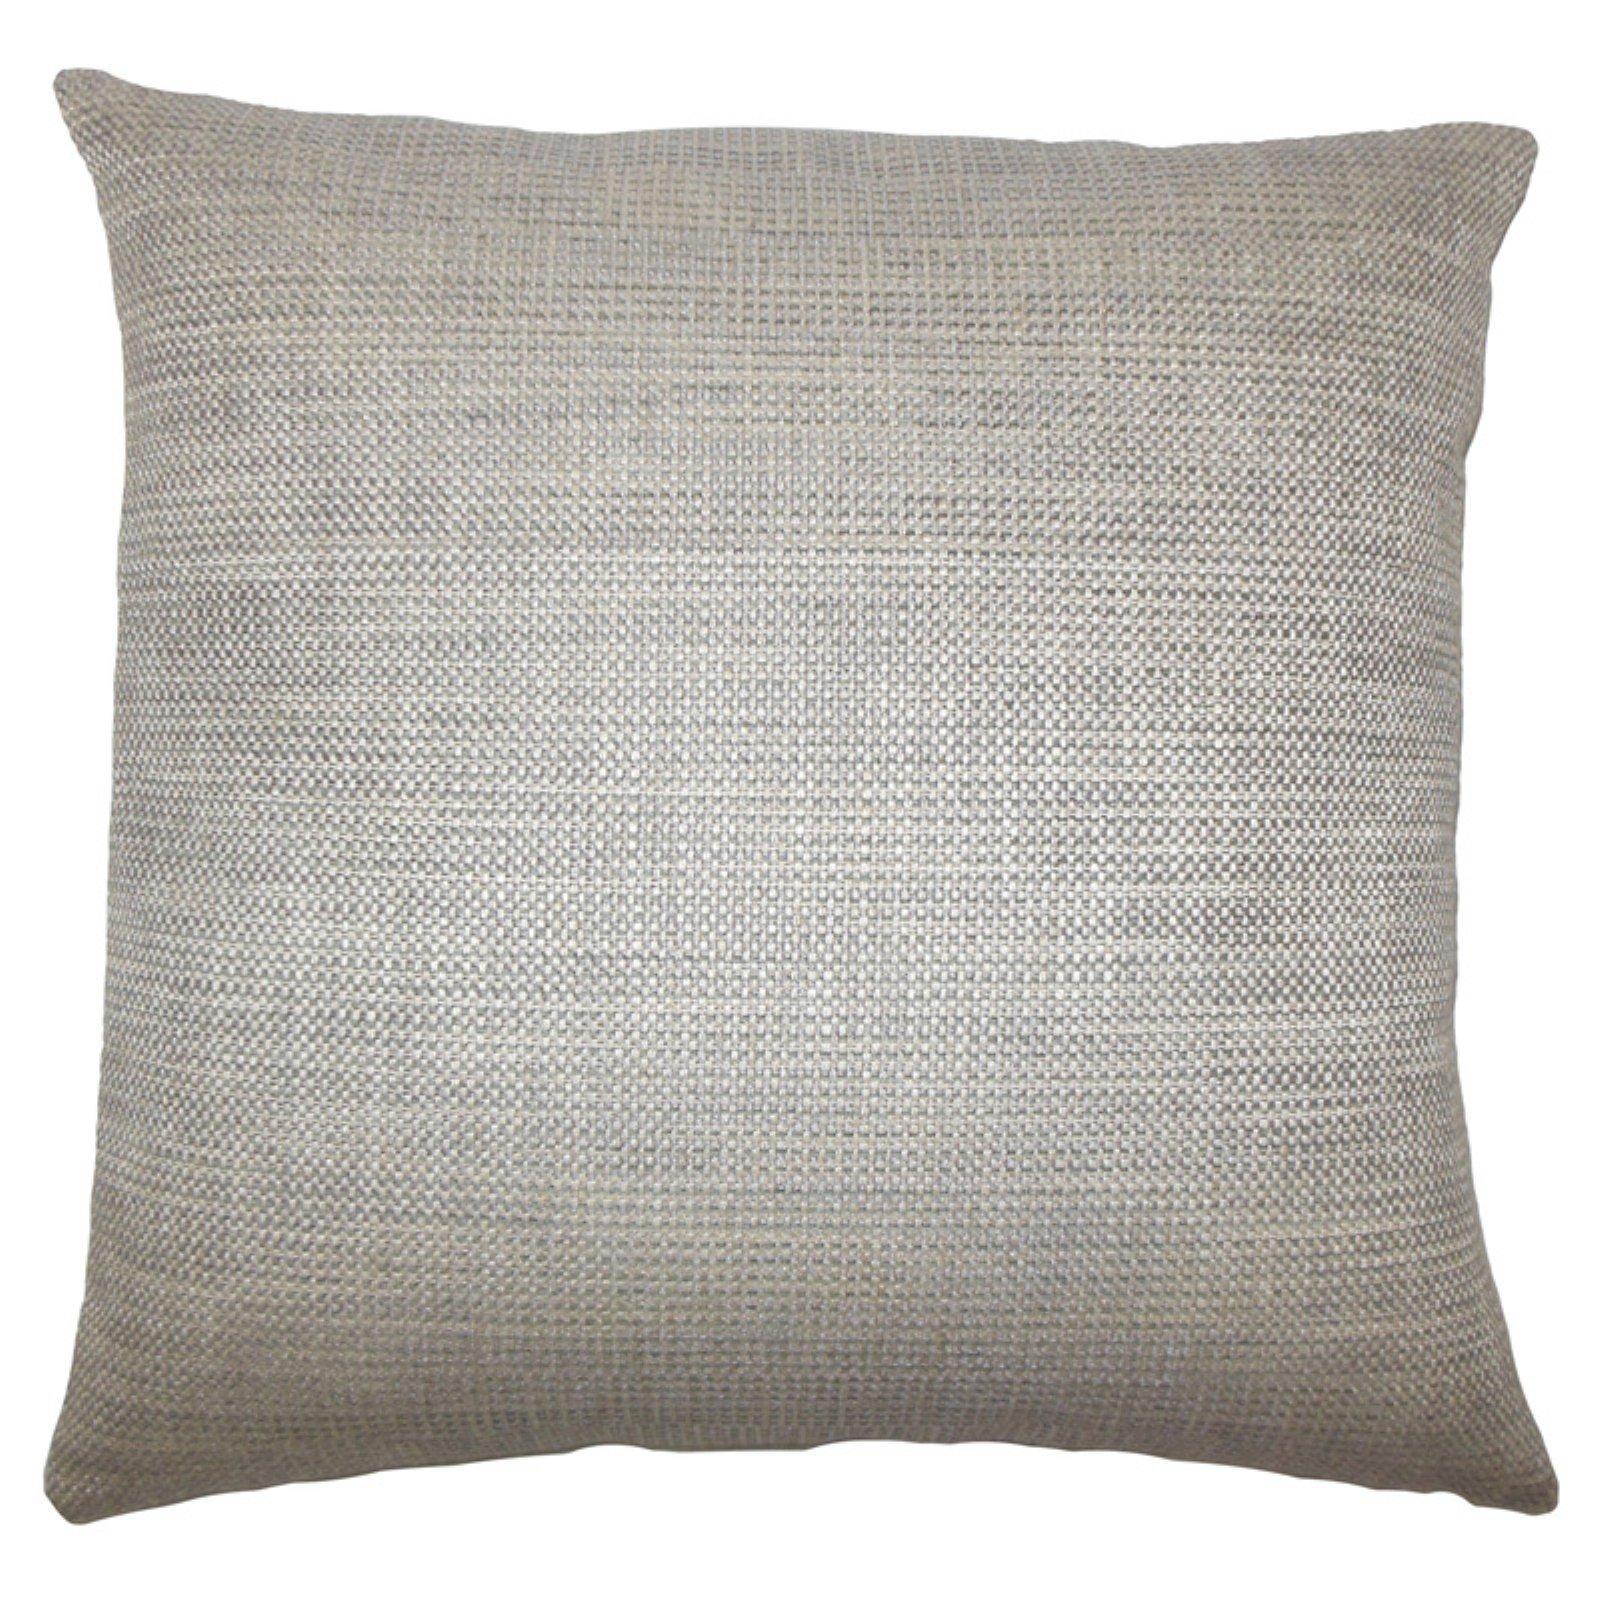 Pillow Collection Daker Decorative Pillow